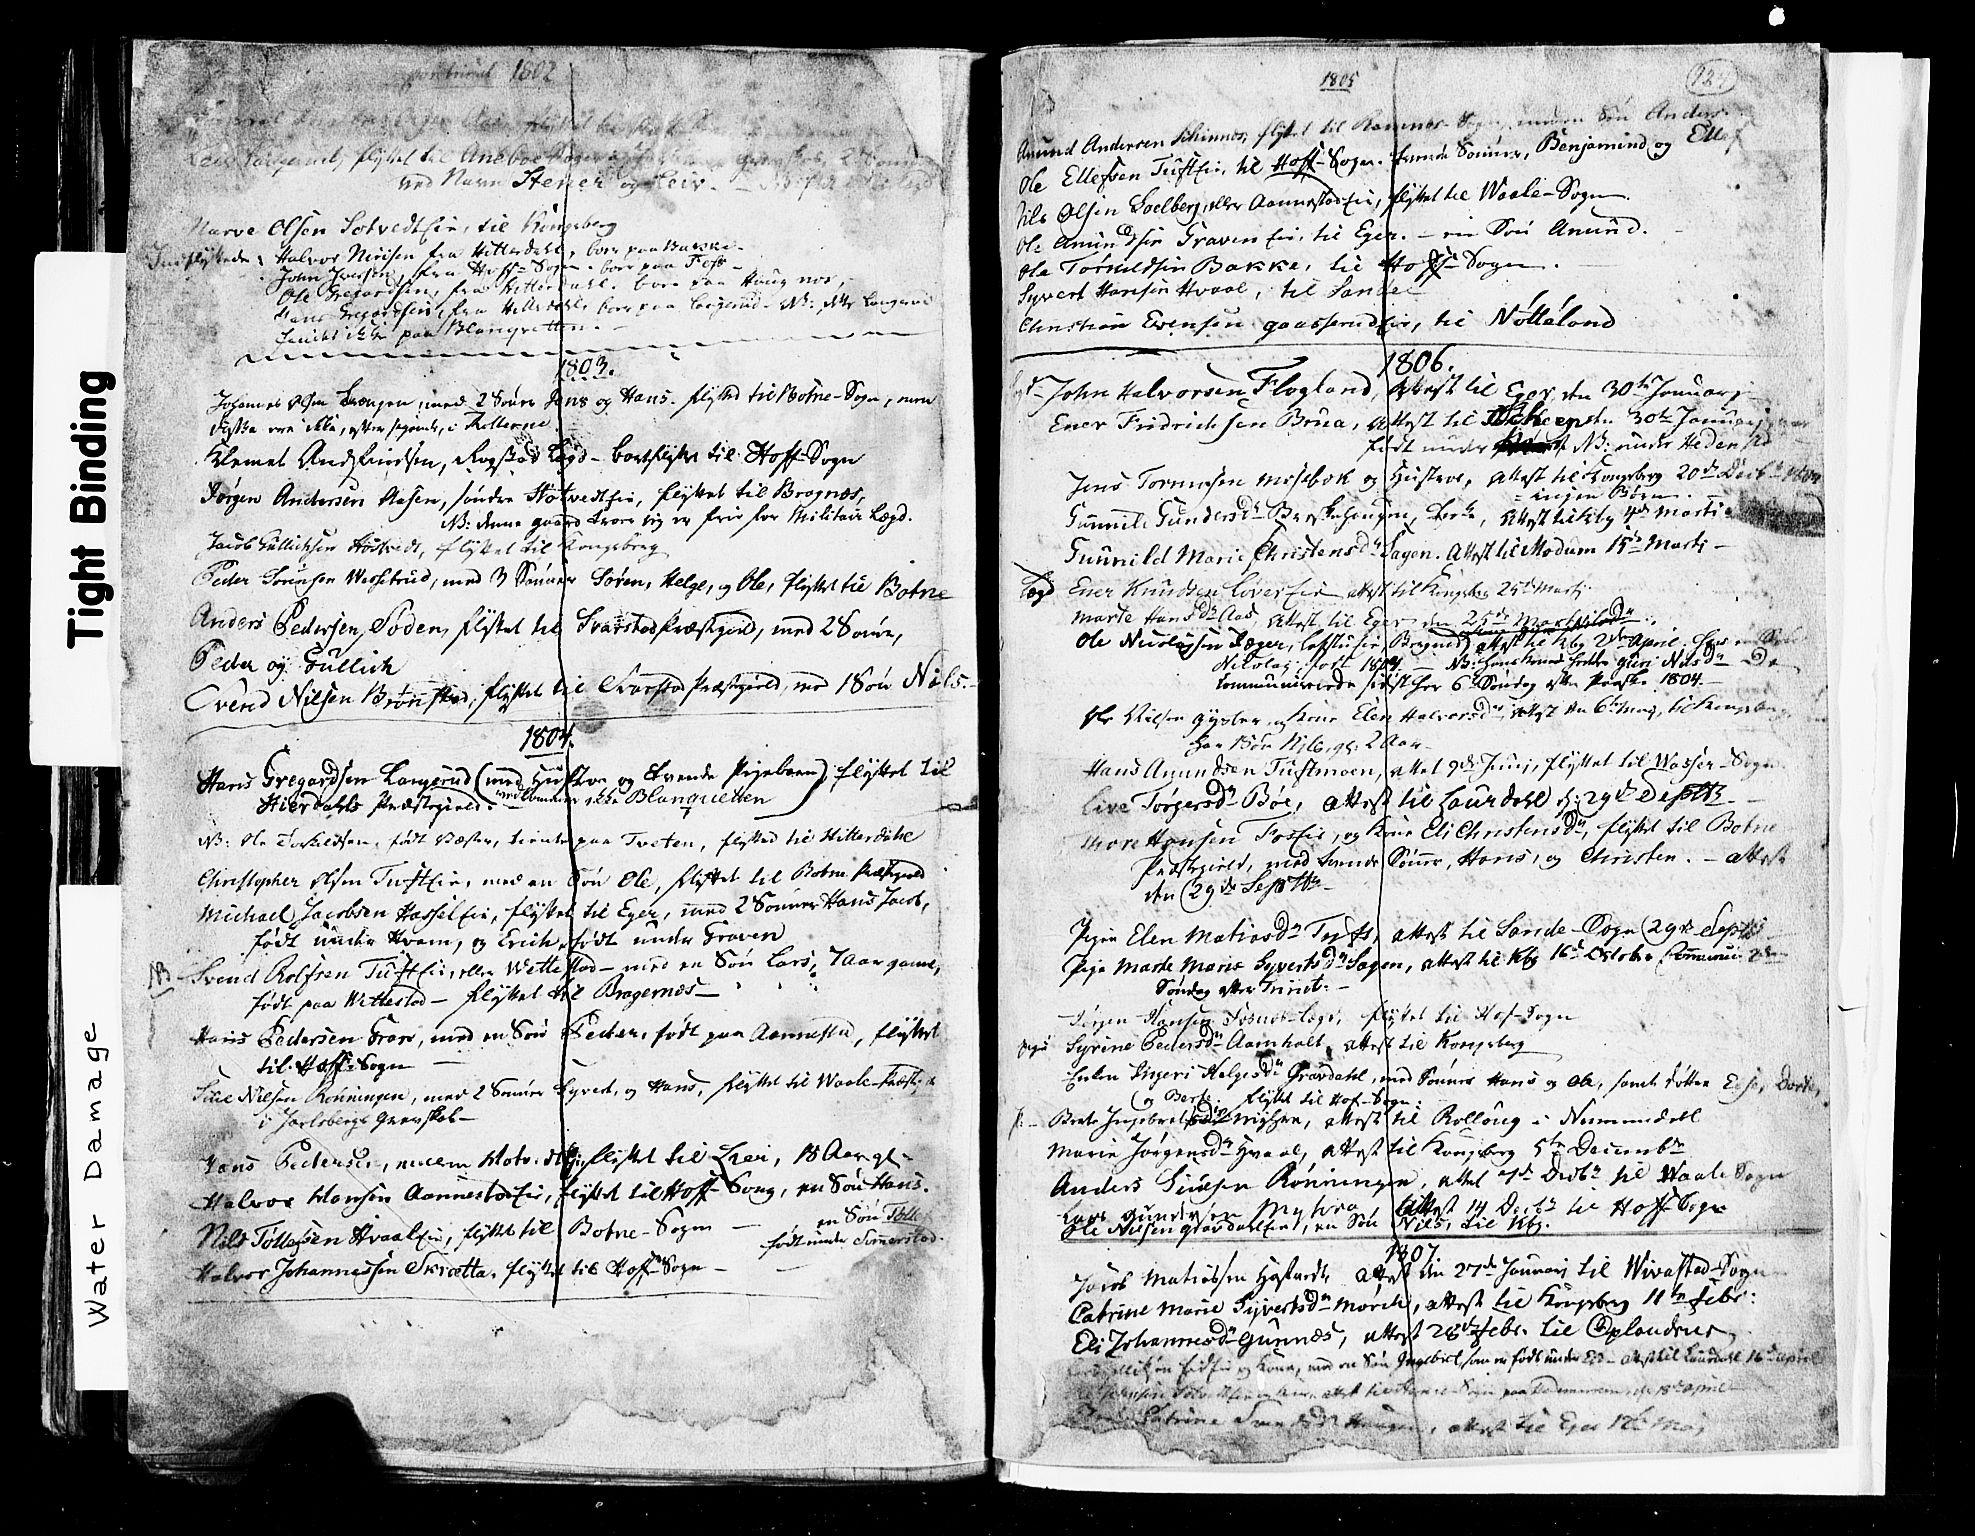 SAKO, Sandsvær kirkebøker, G/Ga/L0002: Klokkerbok nr. I 2, 1796-1817, s. 124